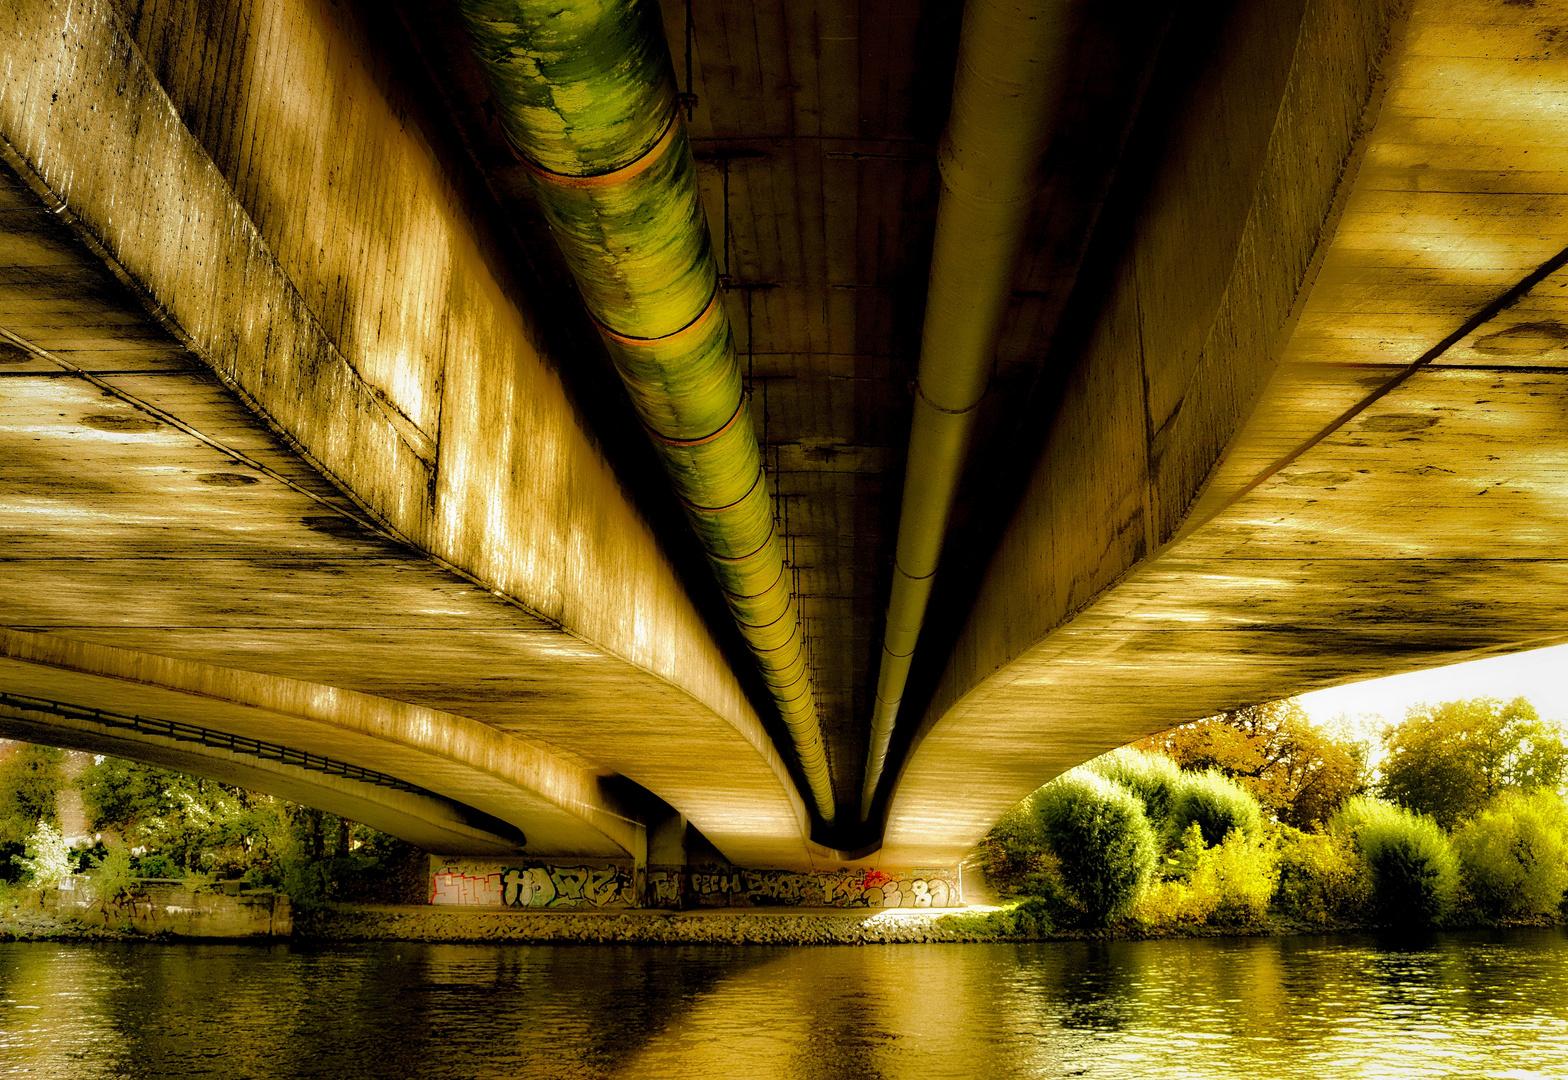 Under the bridge in Spandau